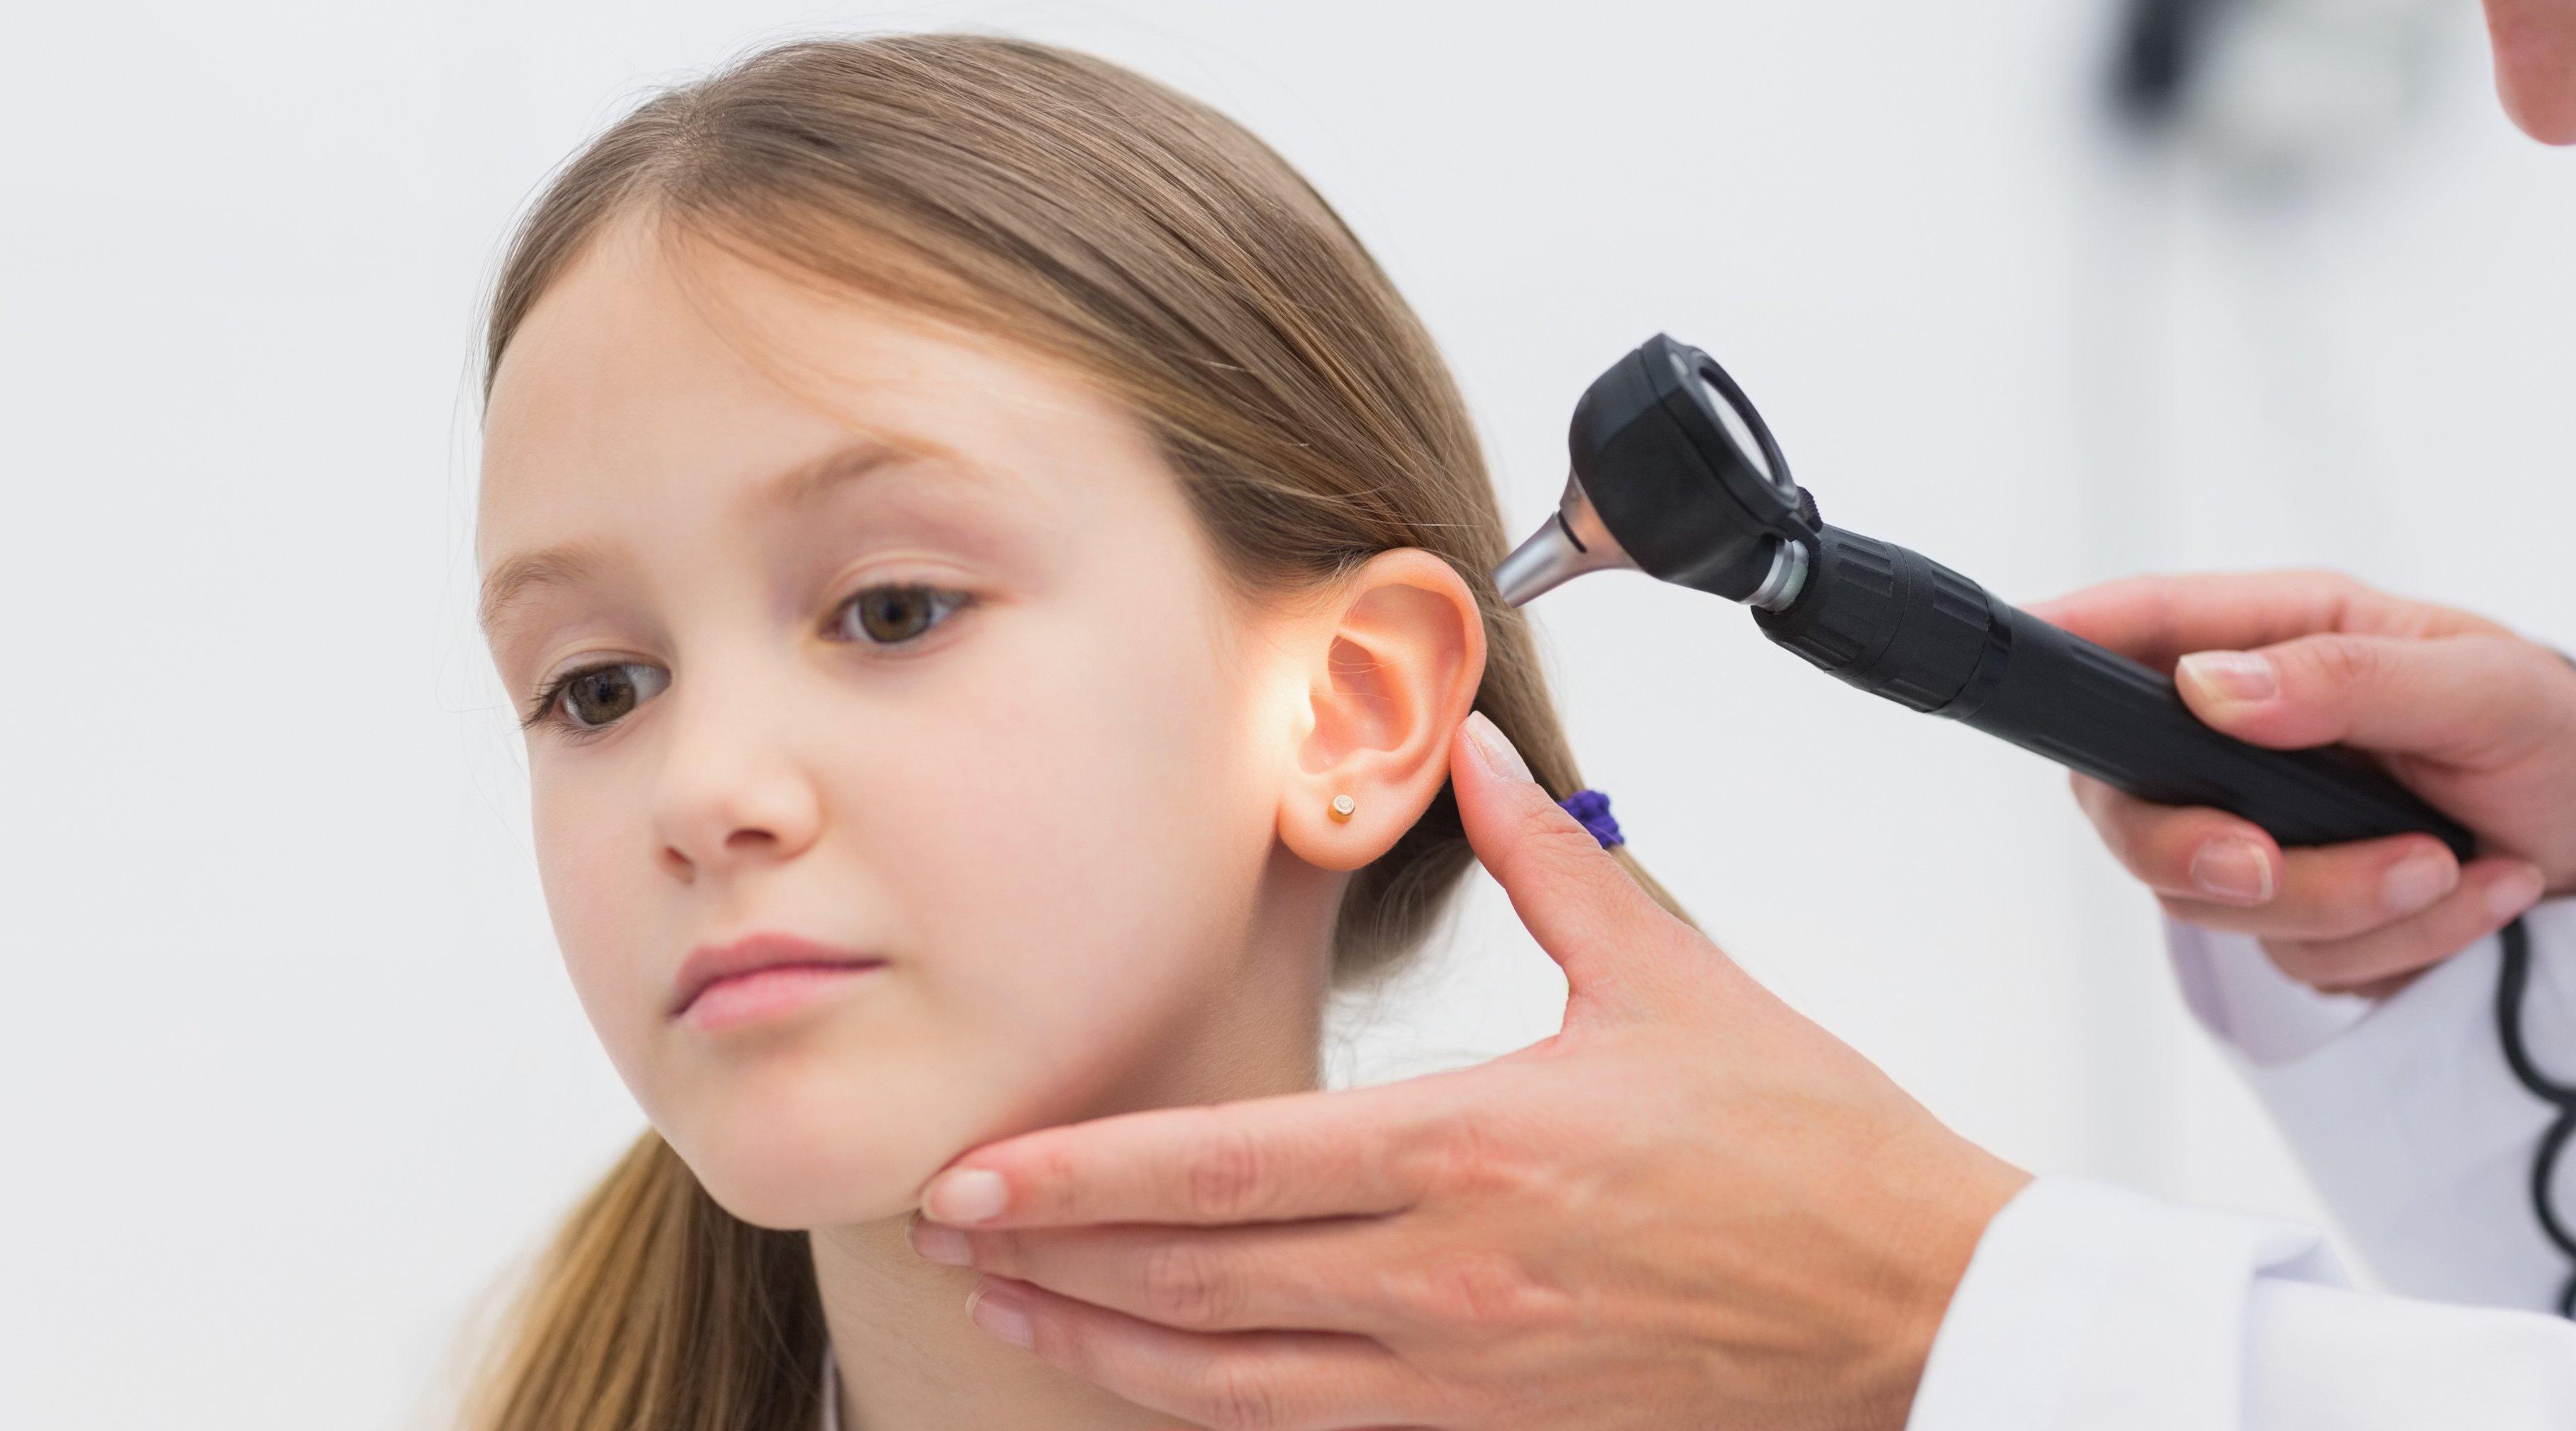 Effective Ways to Make an Earache Go Away